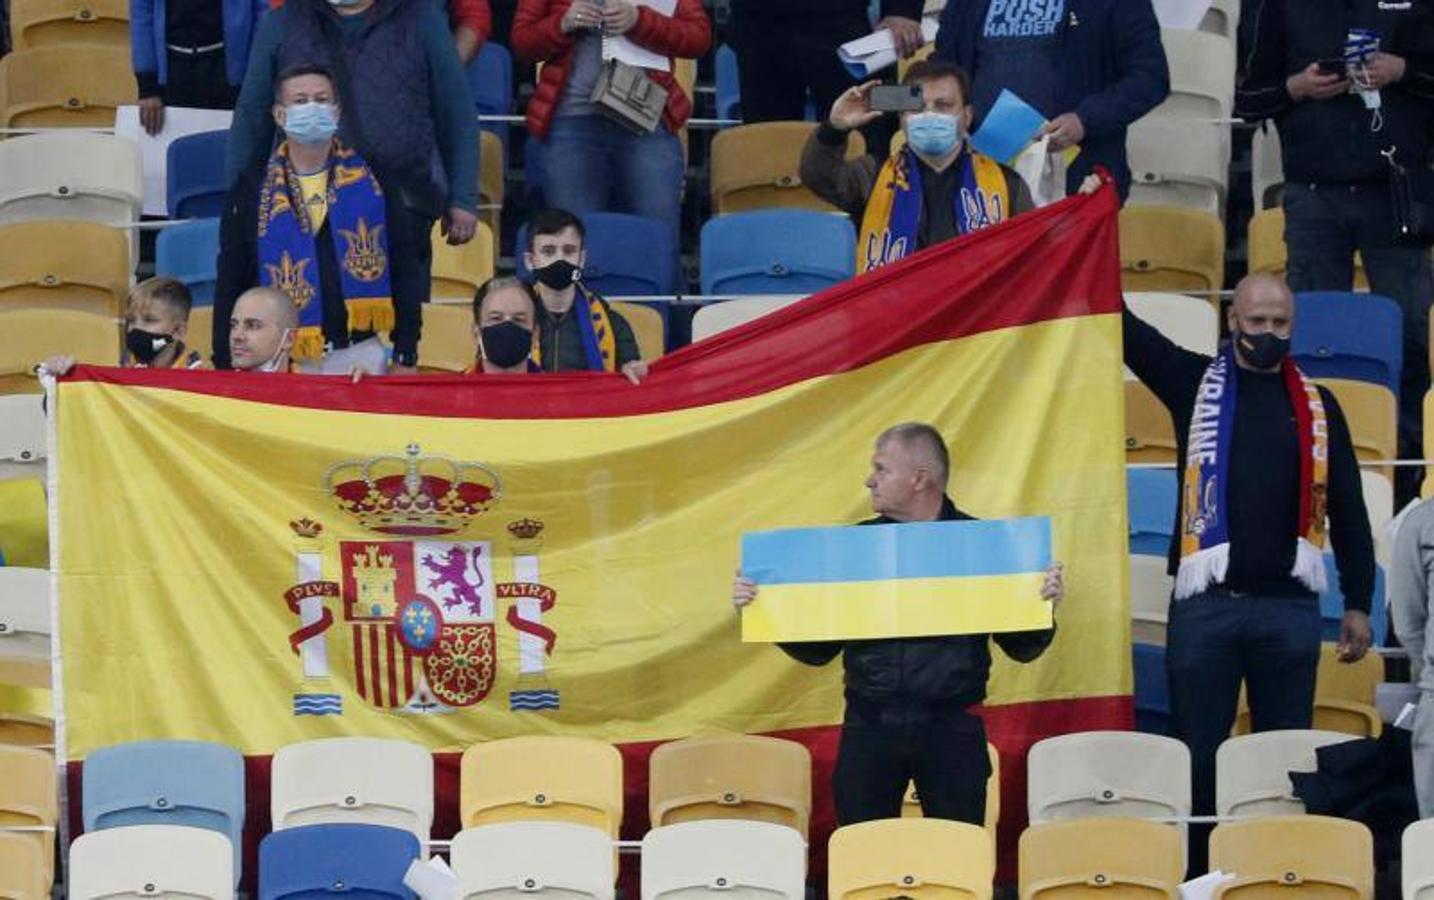 Fotos Las Mejores Imageneas Del Ucrania Espana Hoy